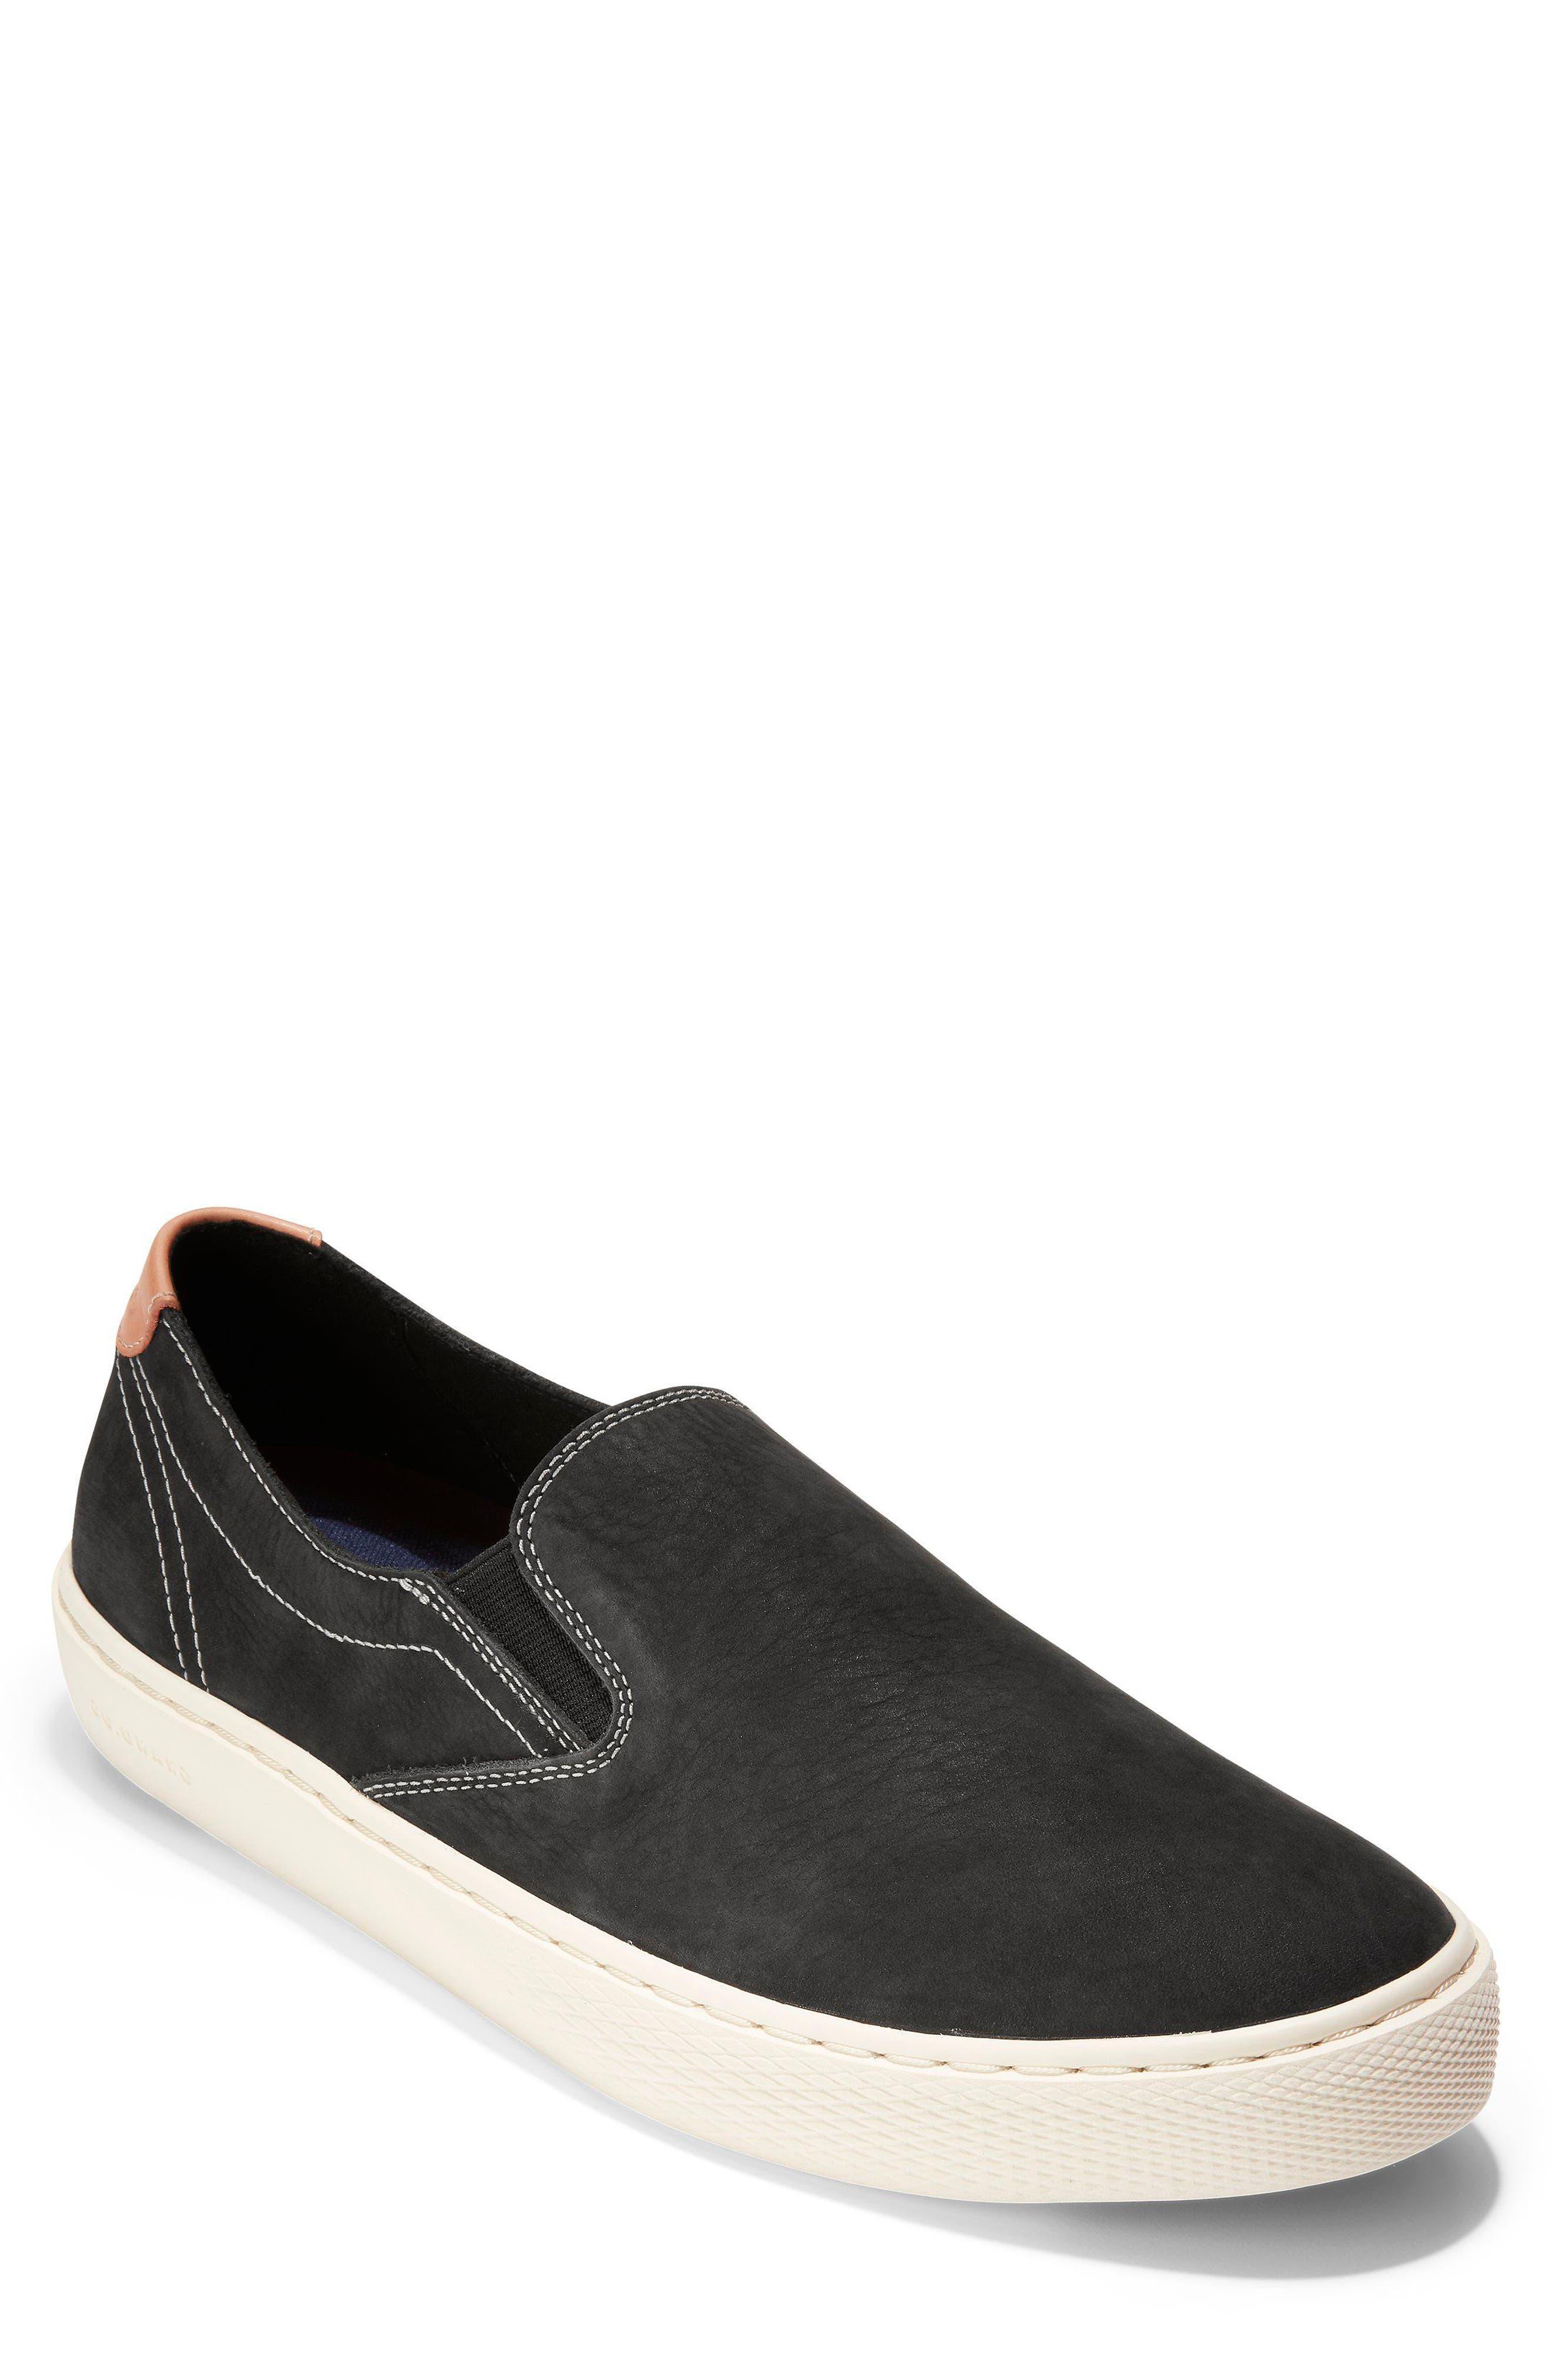 GrandPrø Deck Slip-On Sneaker,                         Main,                         color, BLACK NUBUCK